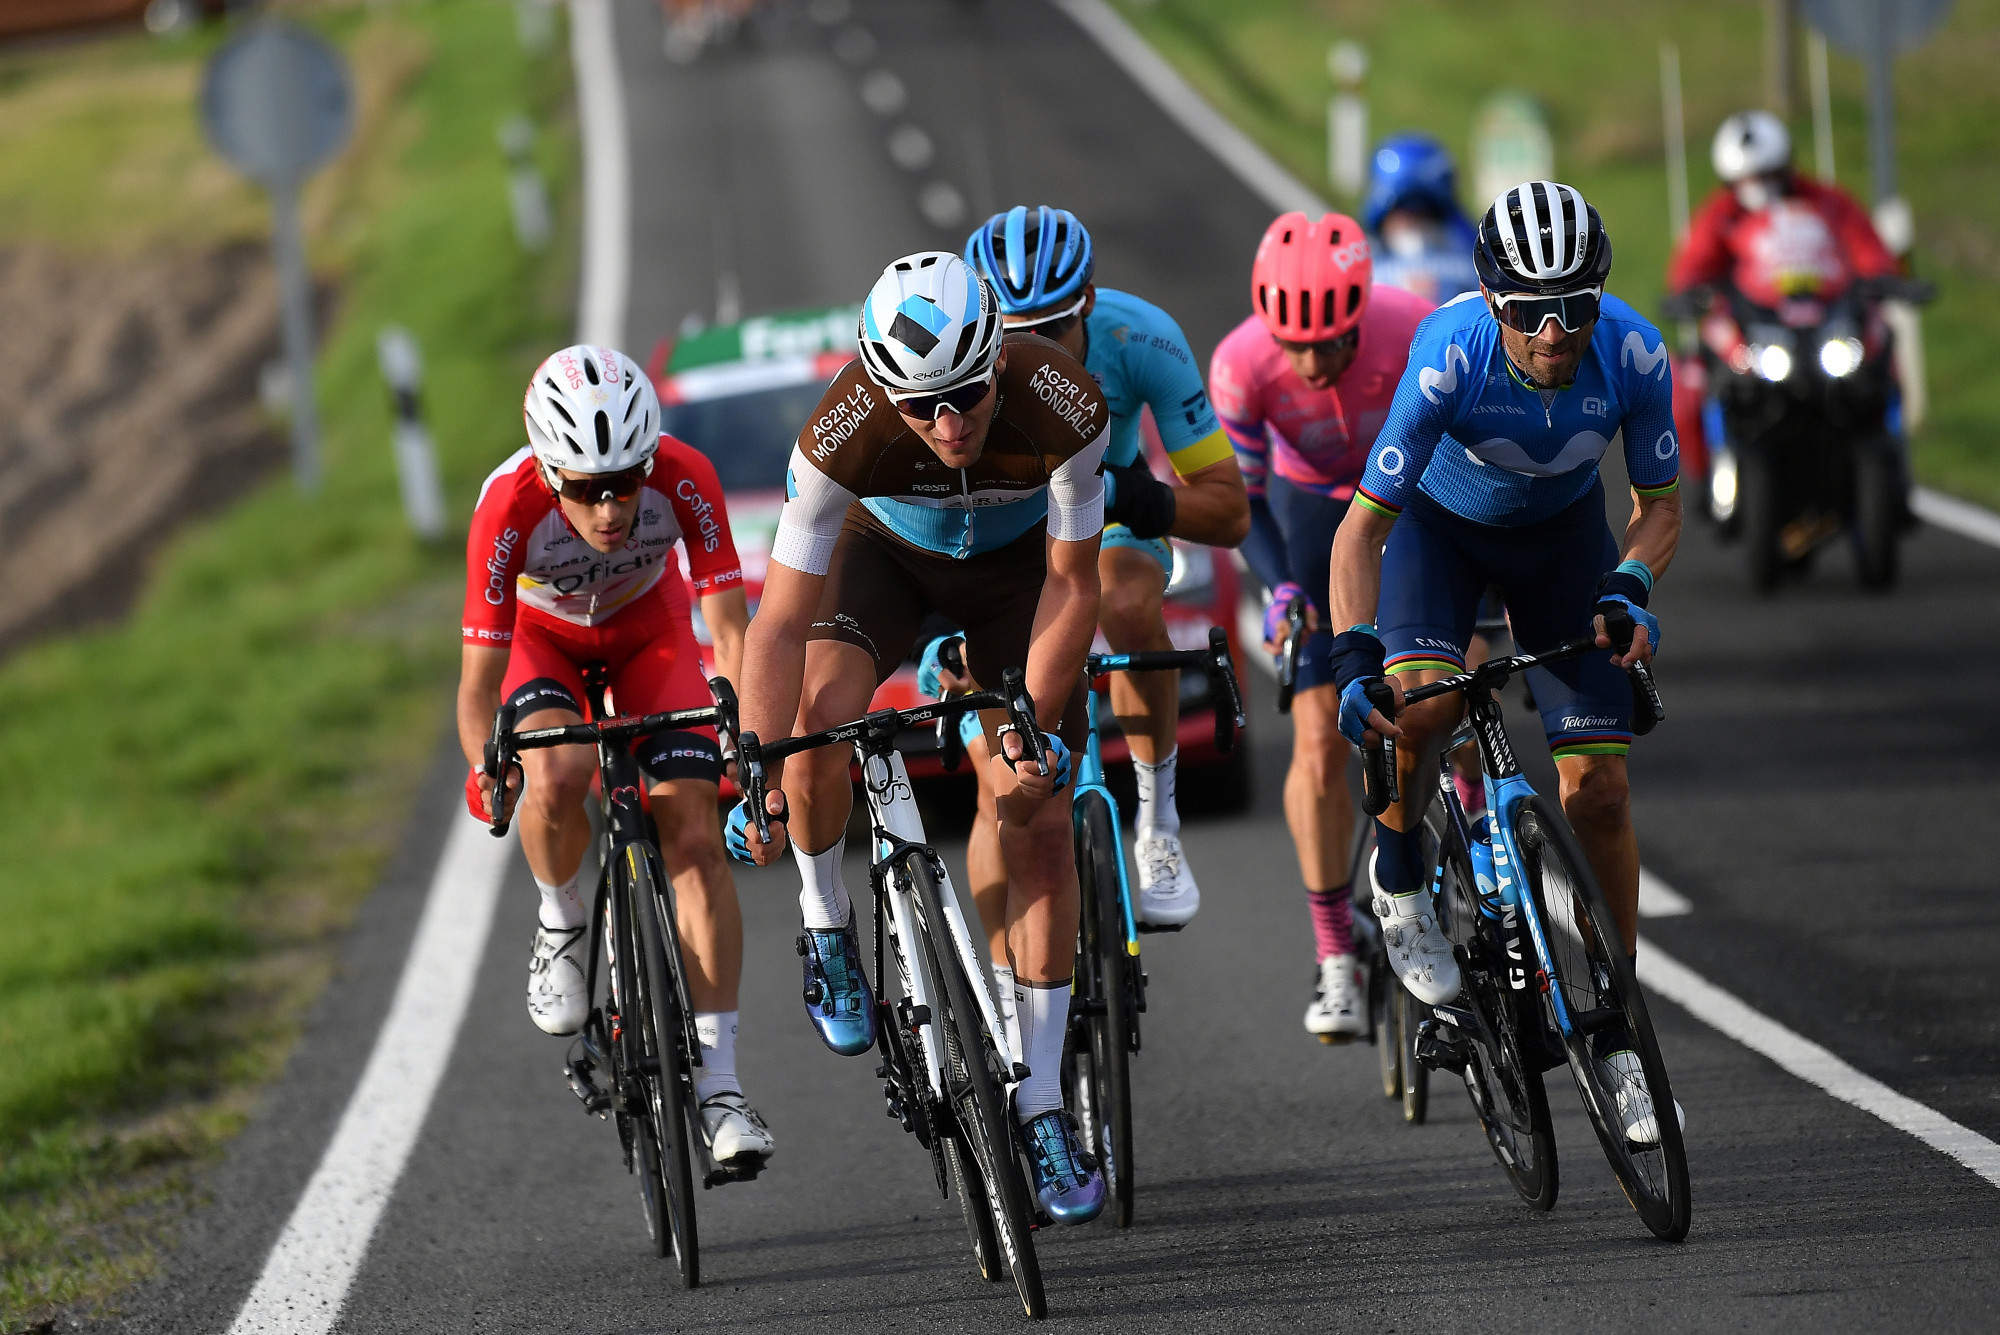 Nans Peters | La Vuelta ciclista a España - Stage 7